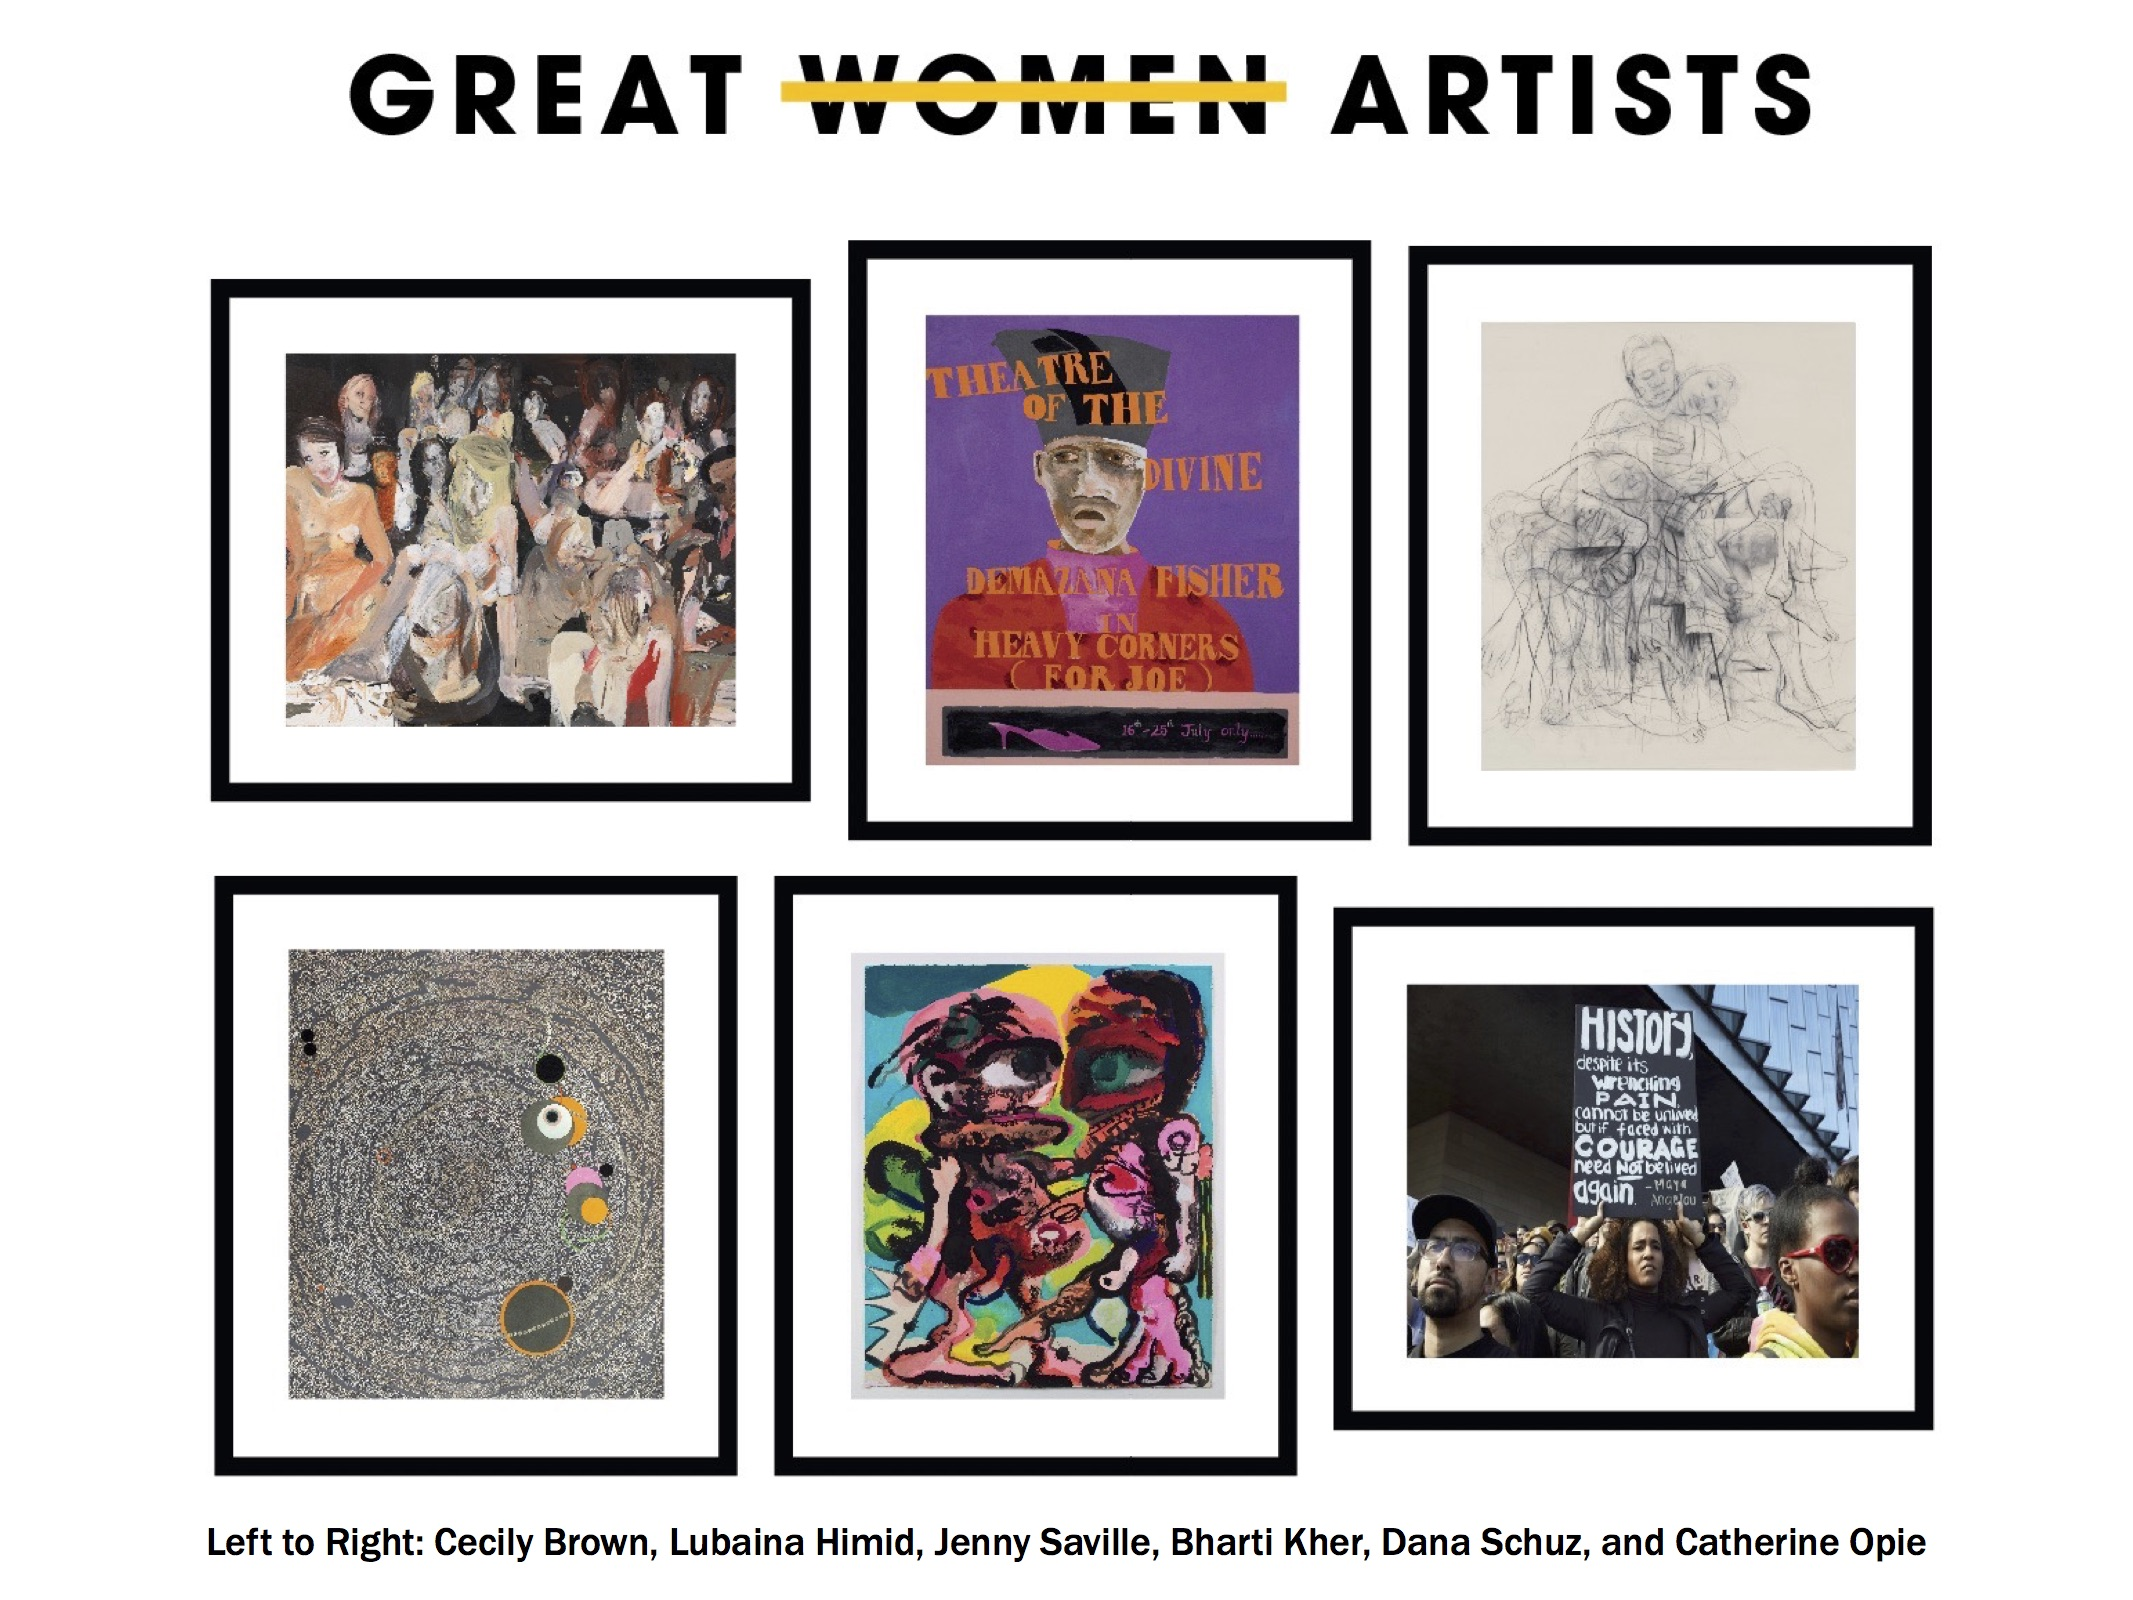 The Great Women Artists Charitable Portfolio of Prints